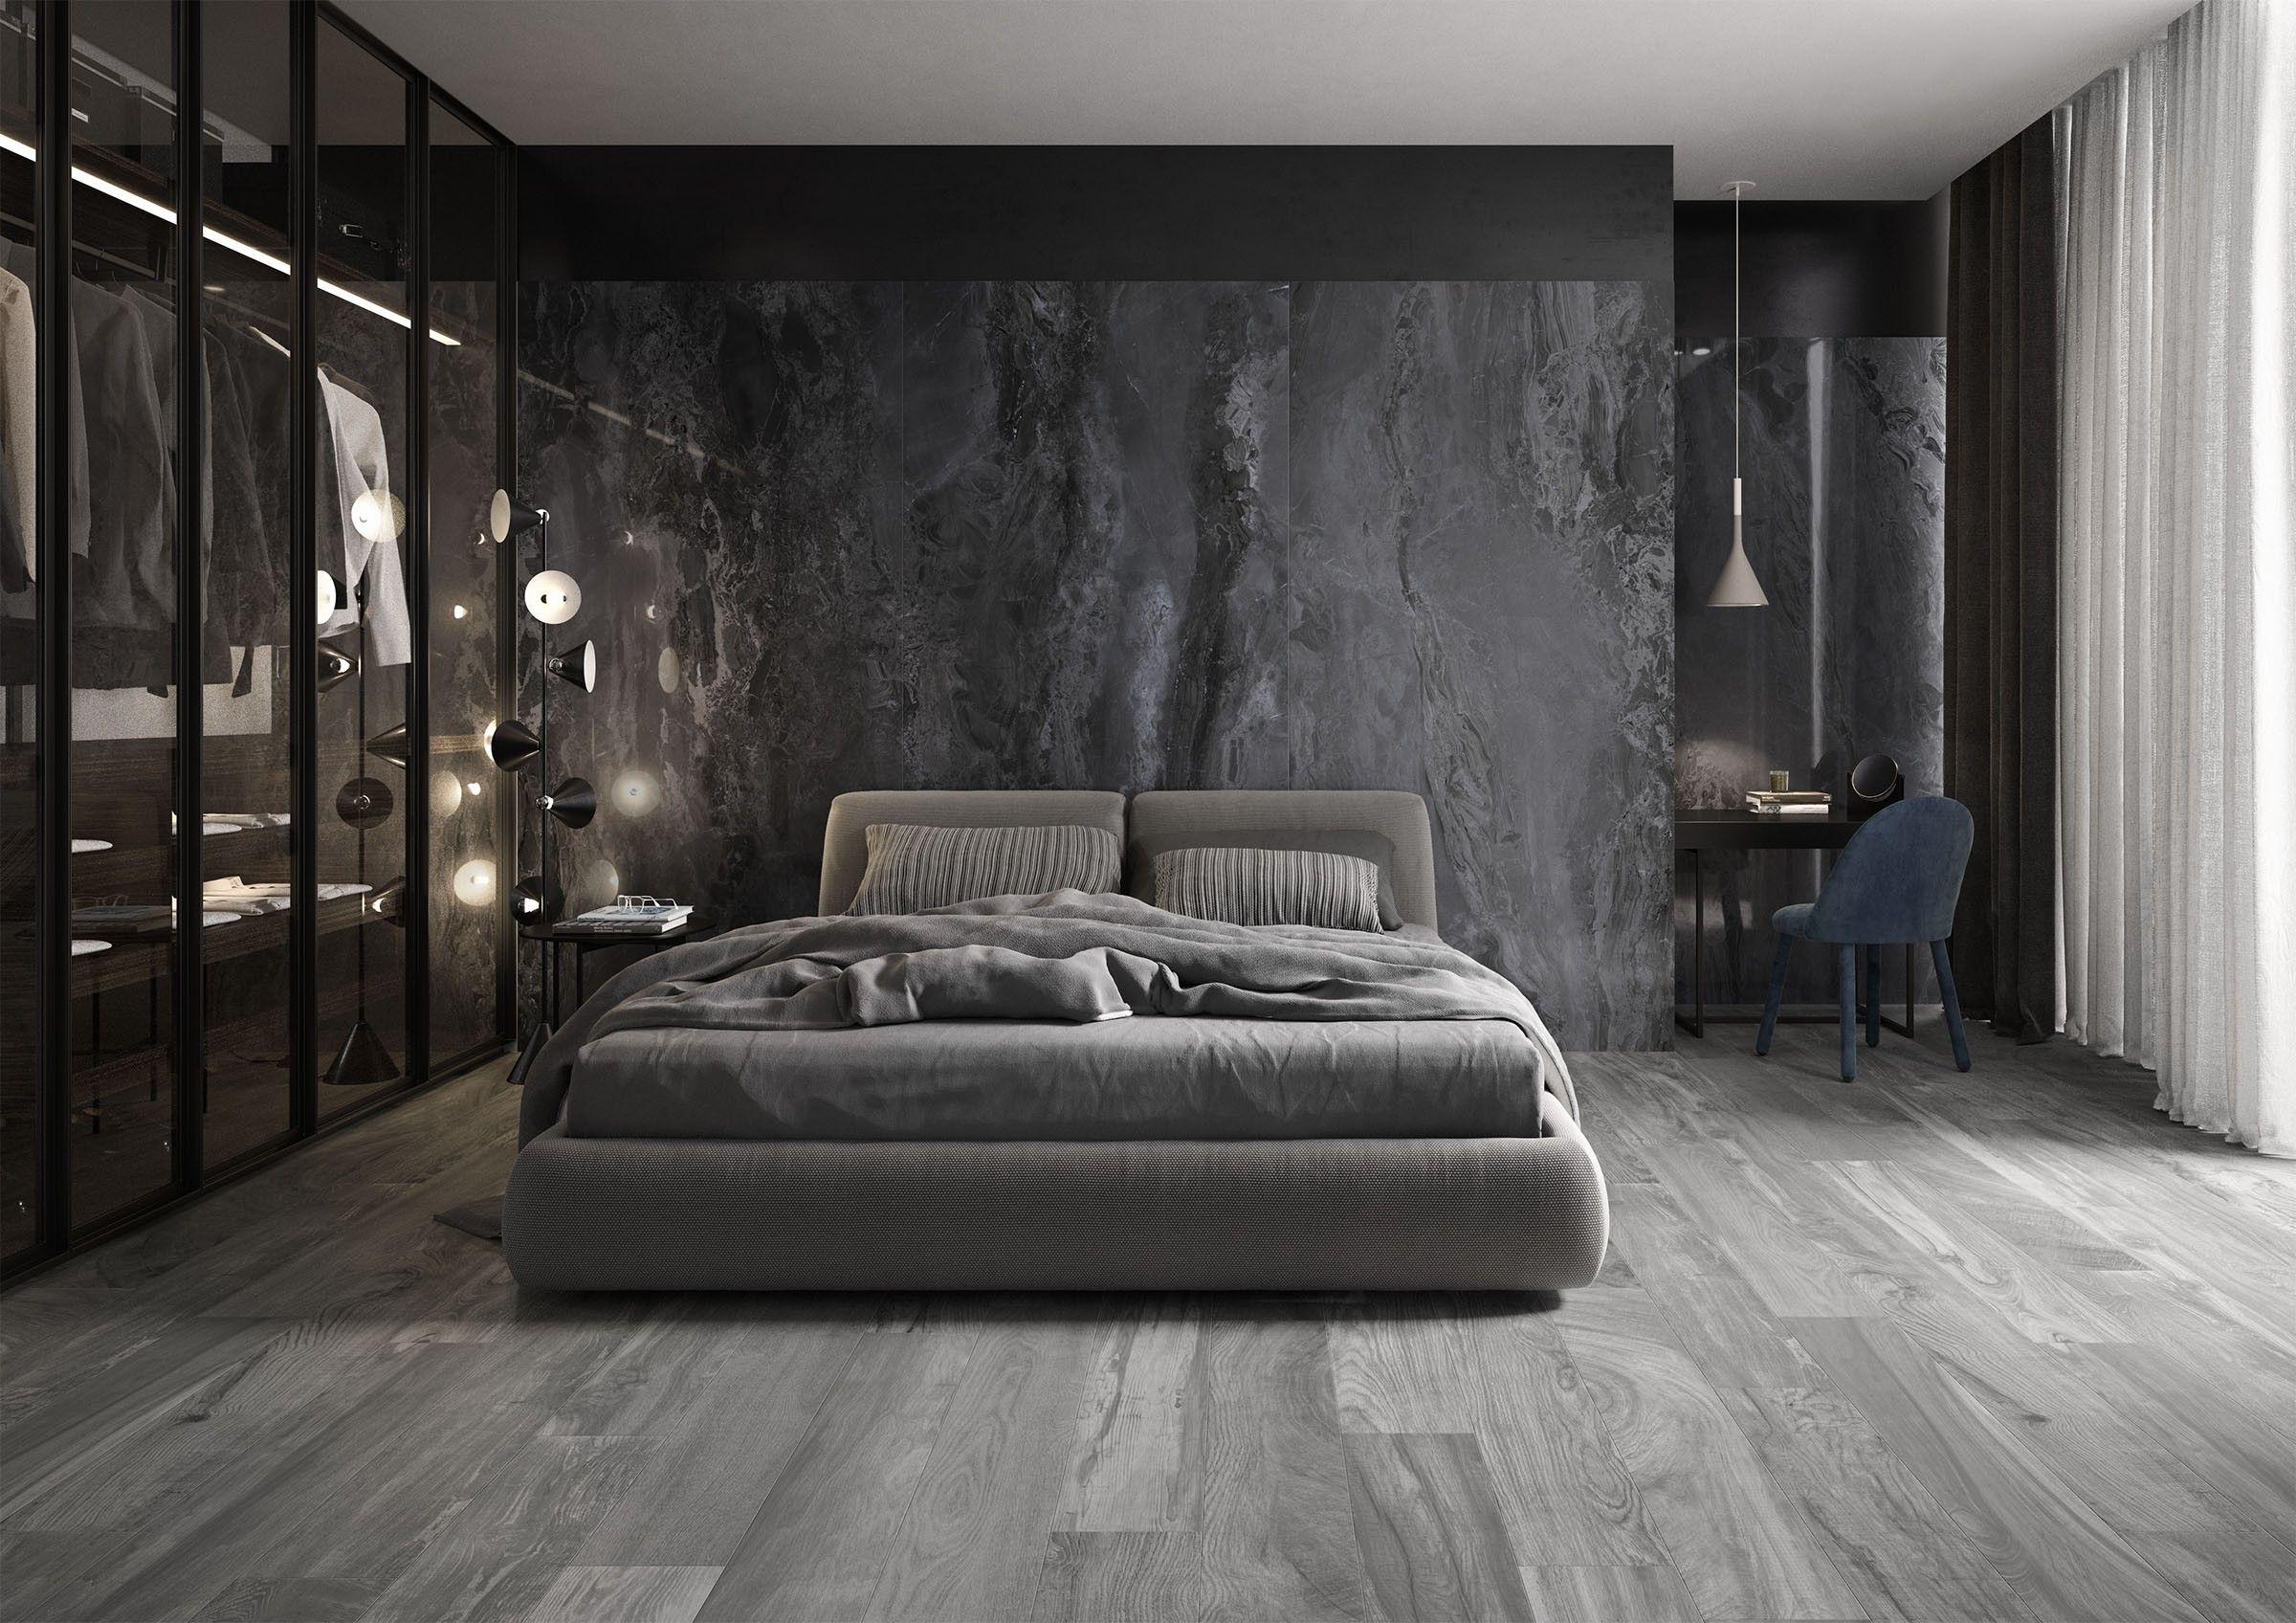 Elle Marble Gres Porcelain Mega Slab Rak Ceramics Bedroom Interior Luxury Bedroom Decor Master Bedroom Interior Most popular room ceramics